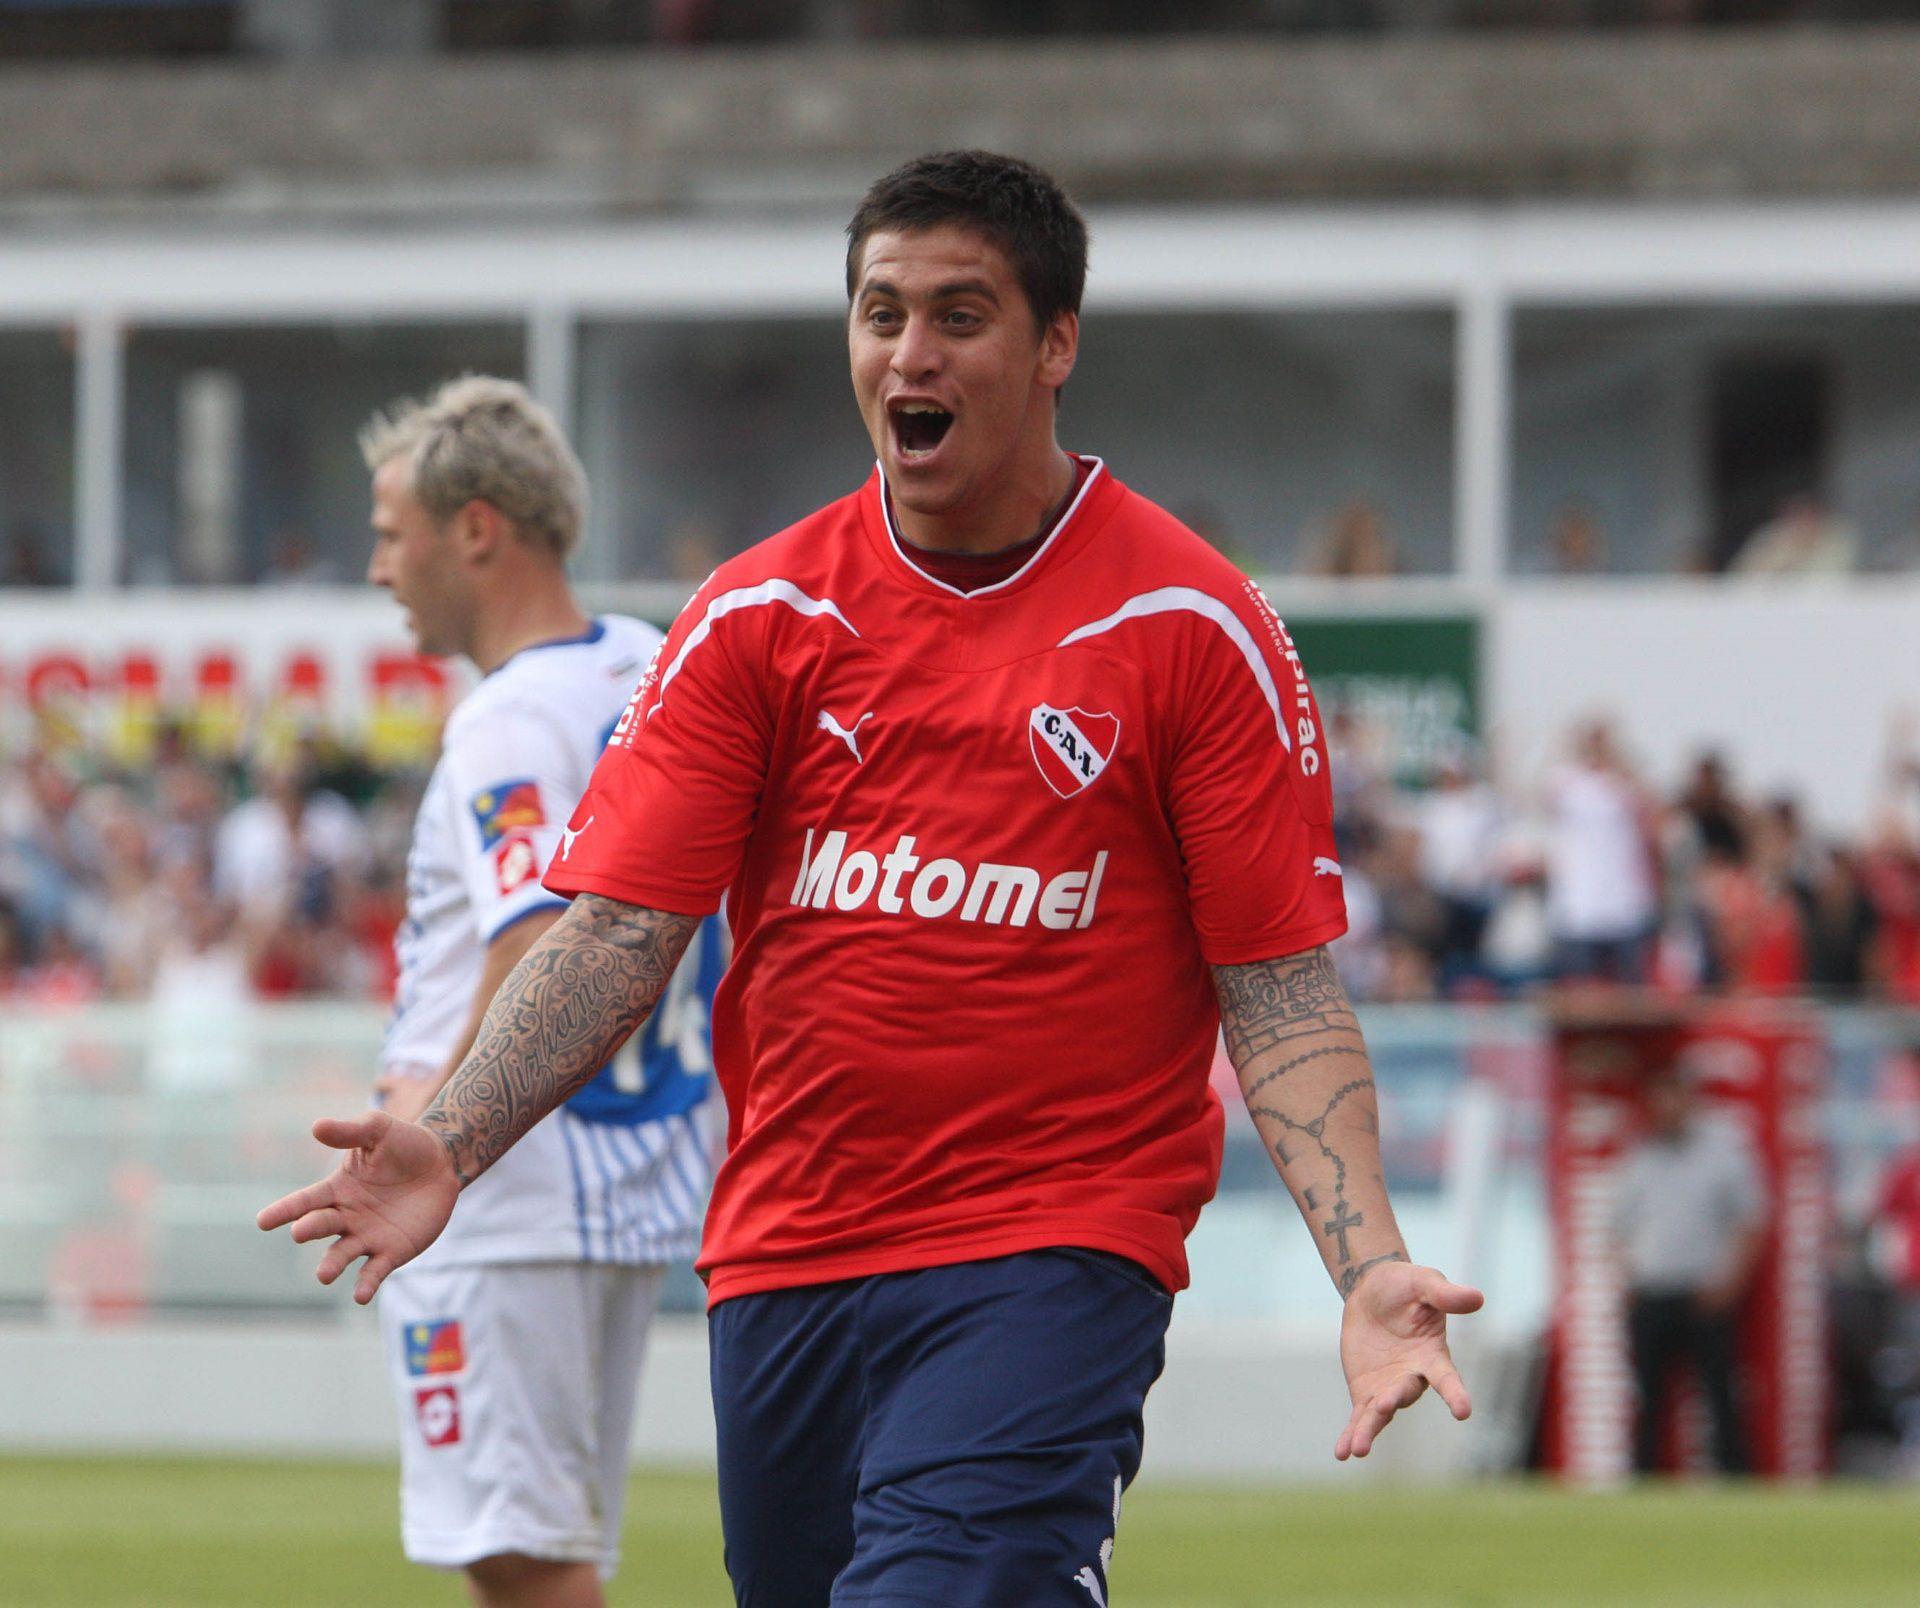 Leonel Nuñez Independiente 2011